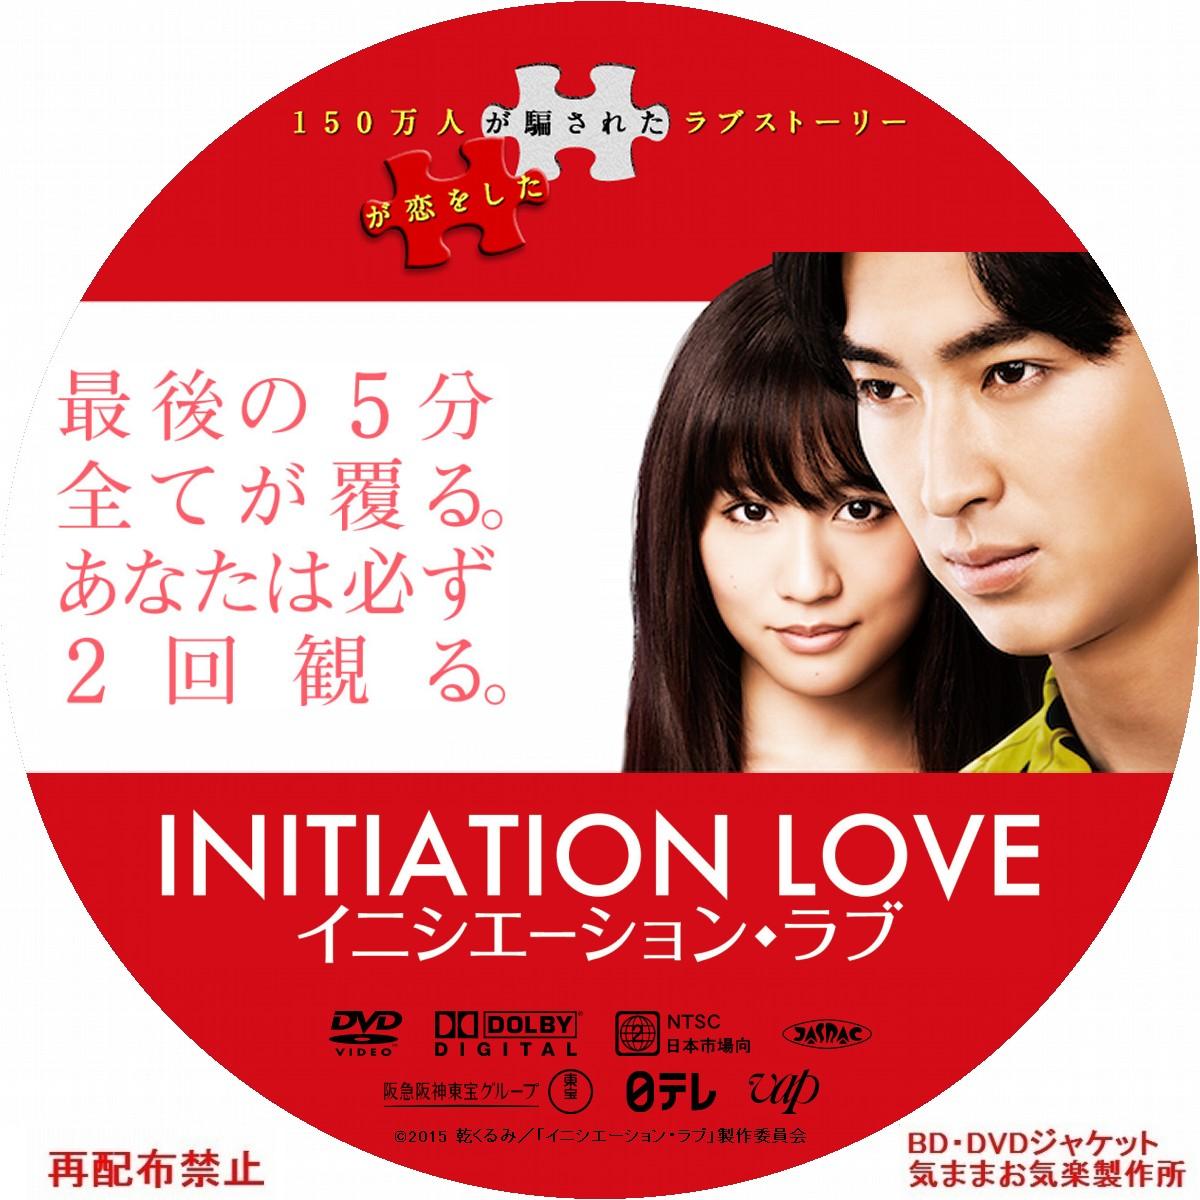 INITIATION_LOVE_DVD.jpg